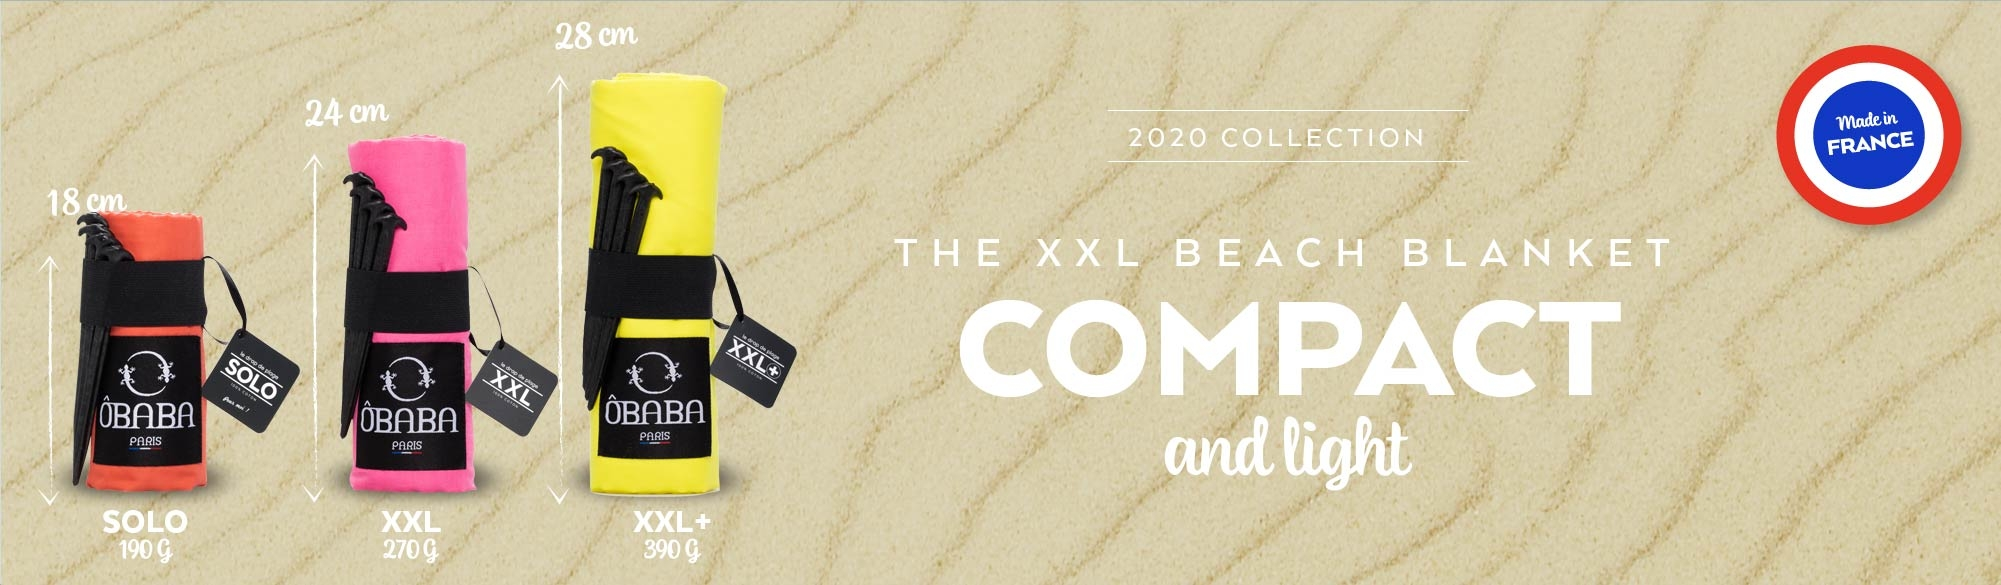 The compact beach blanket